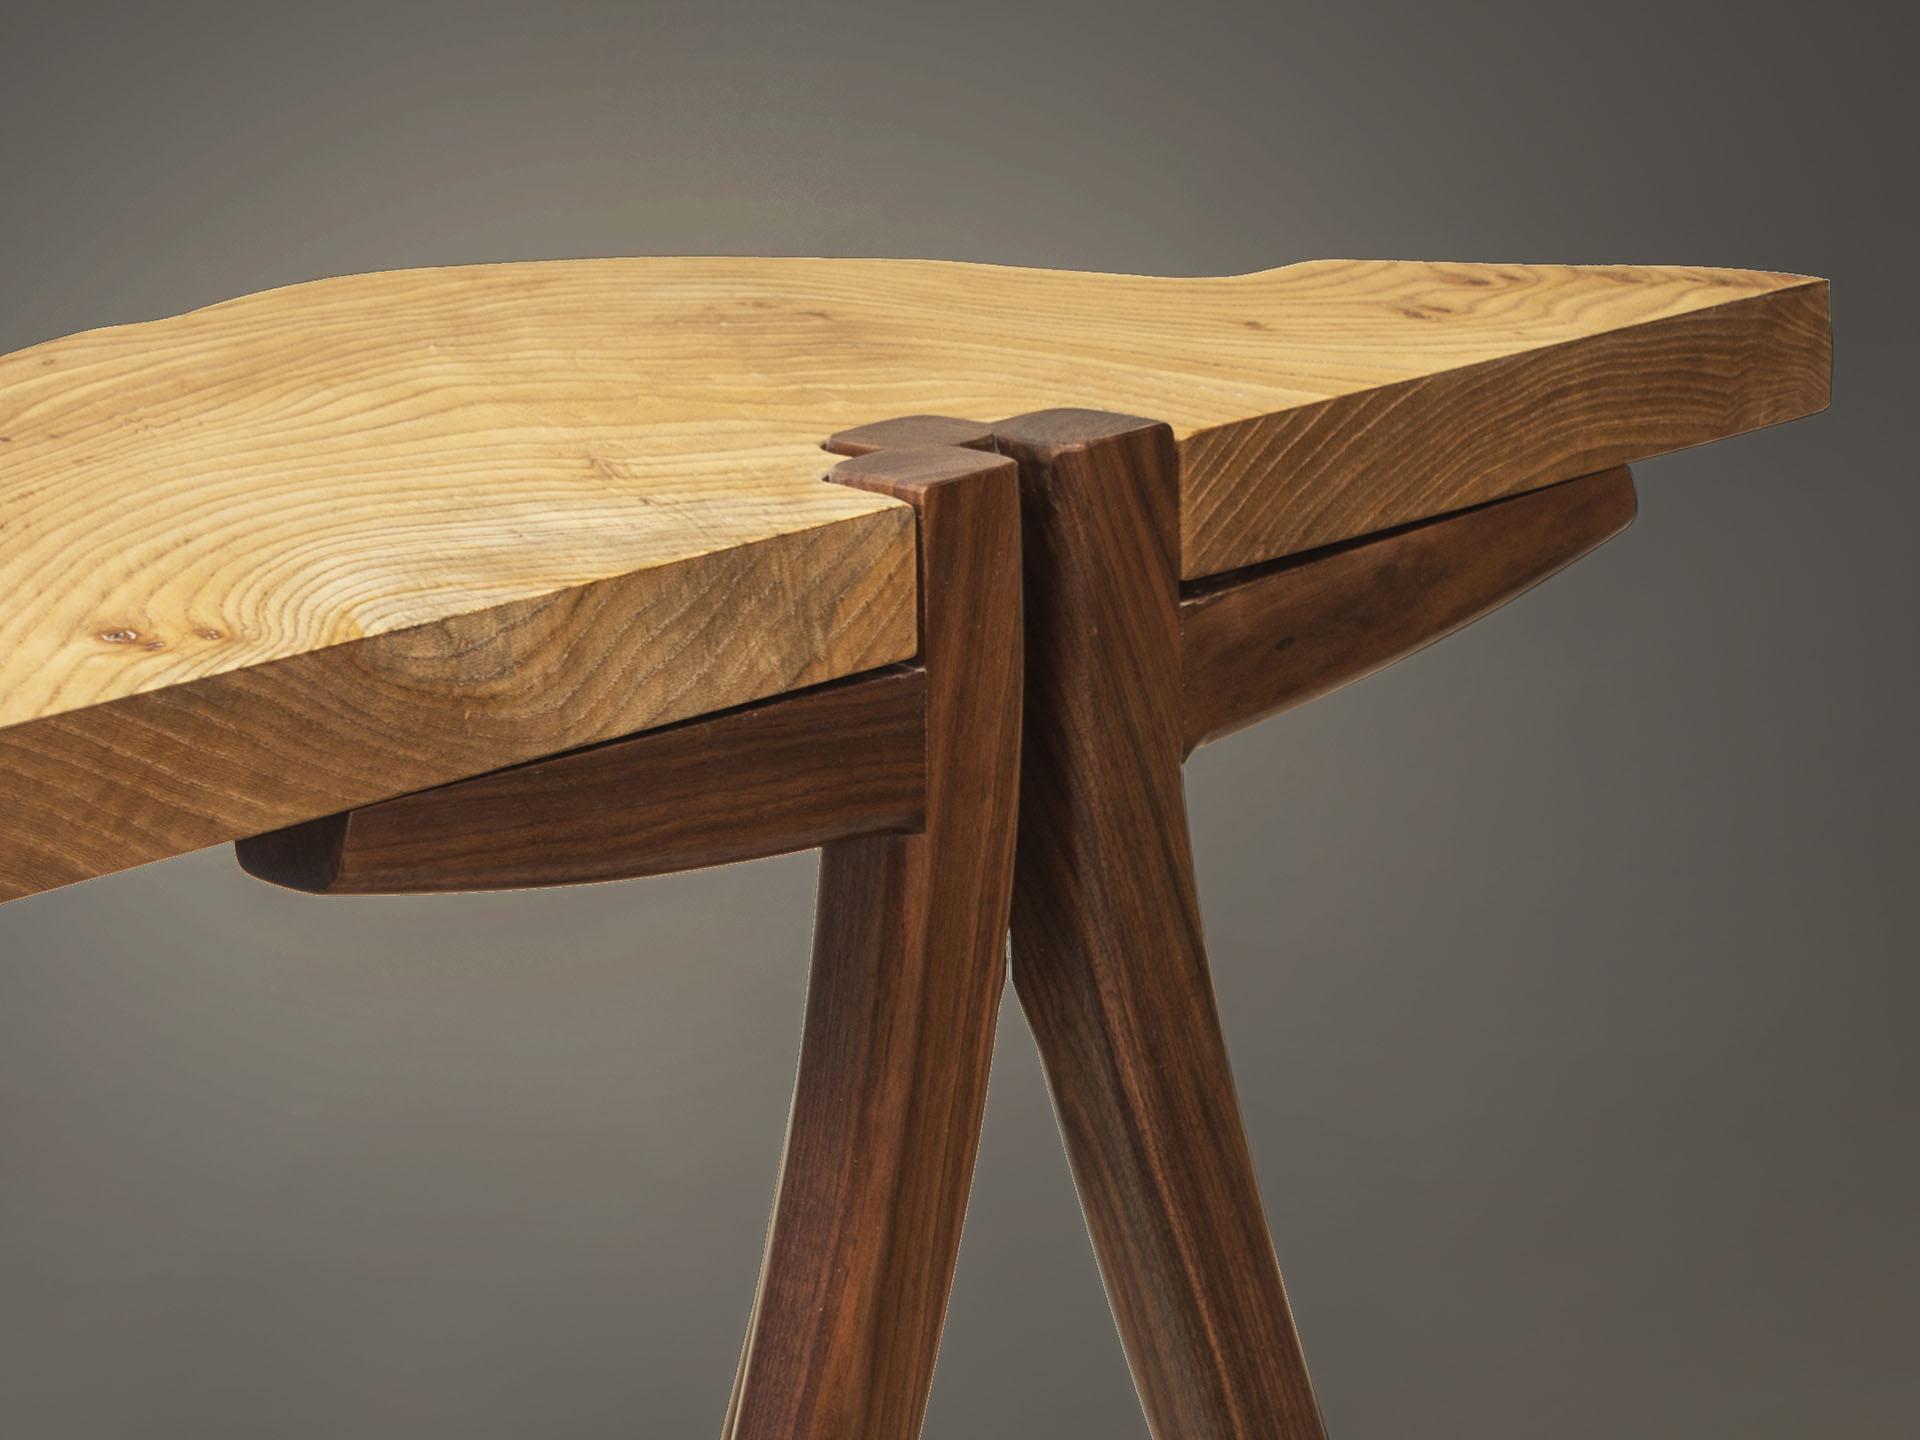 khls table detail 0841 sm.jpg